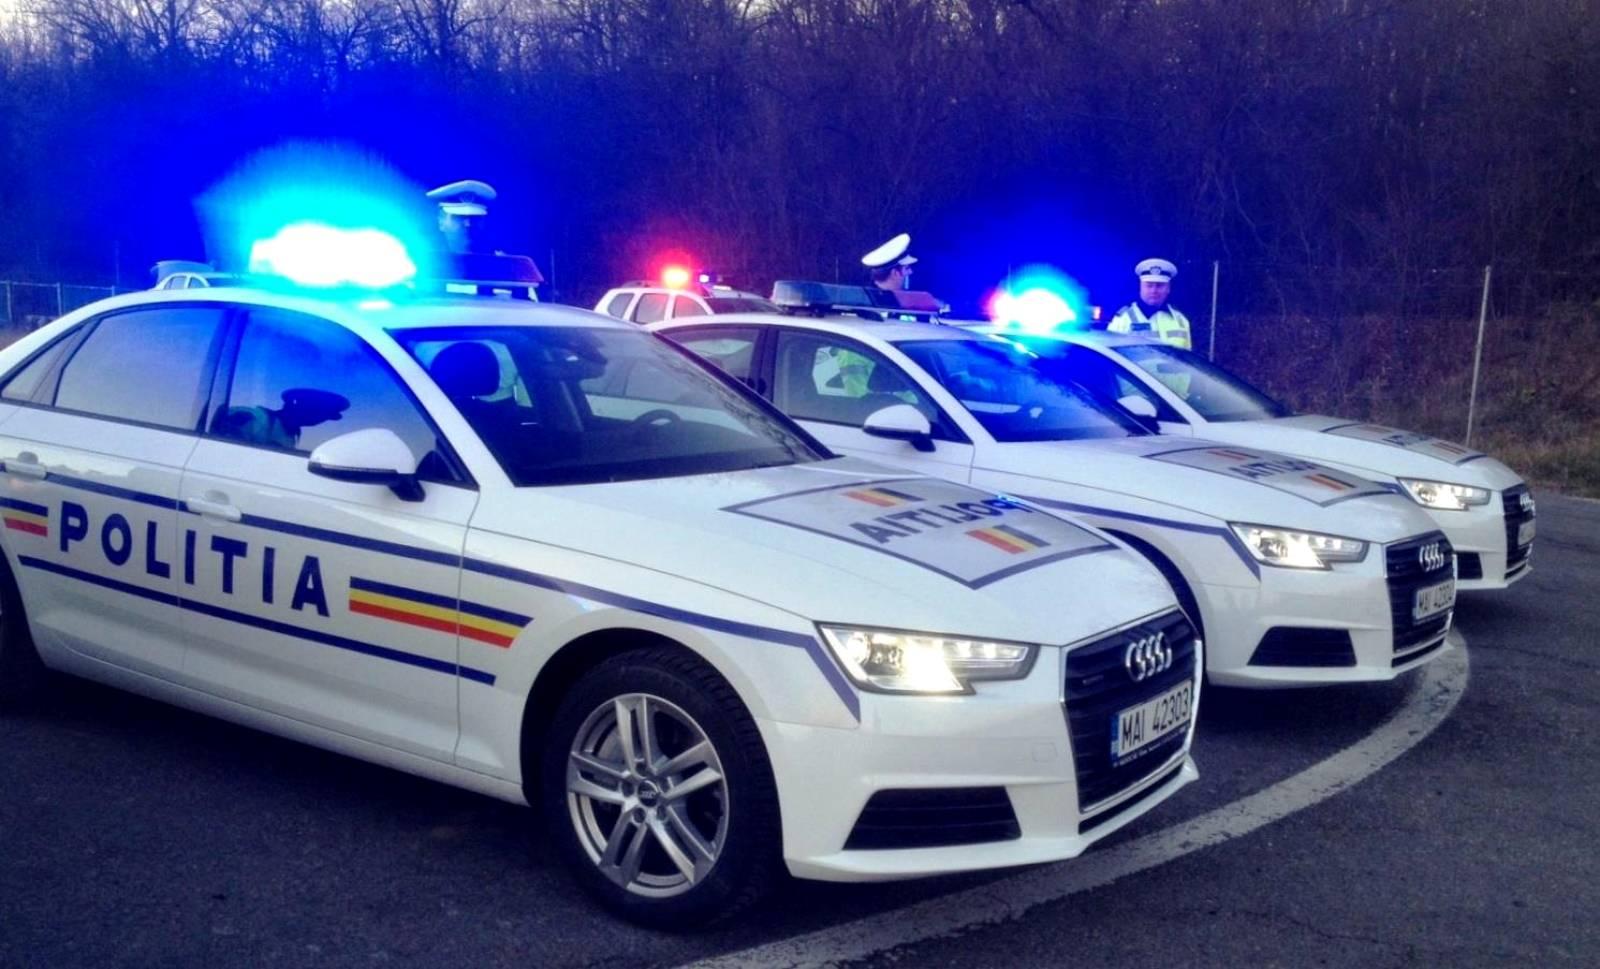 Politia Romana filtre 15 mai